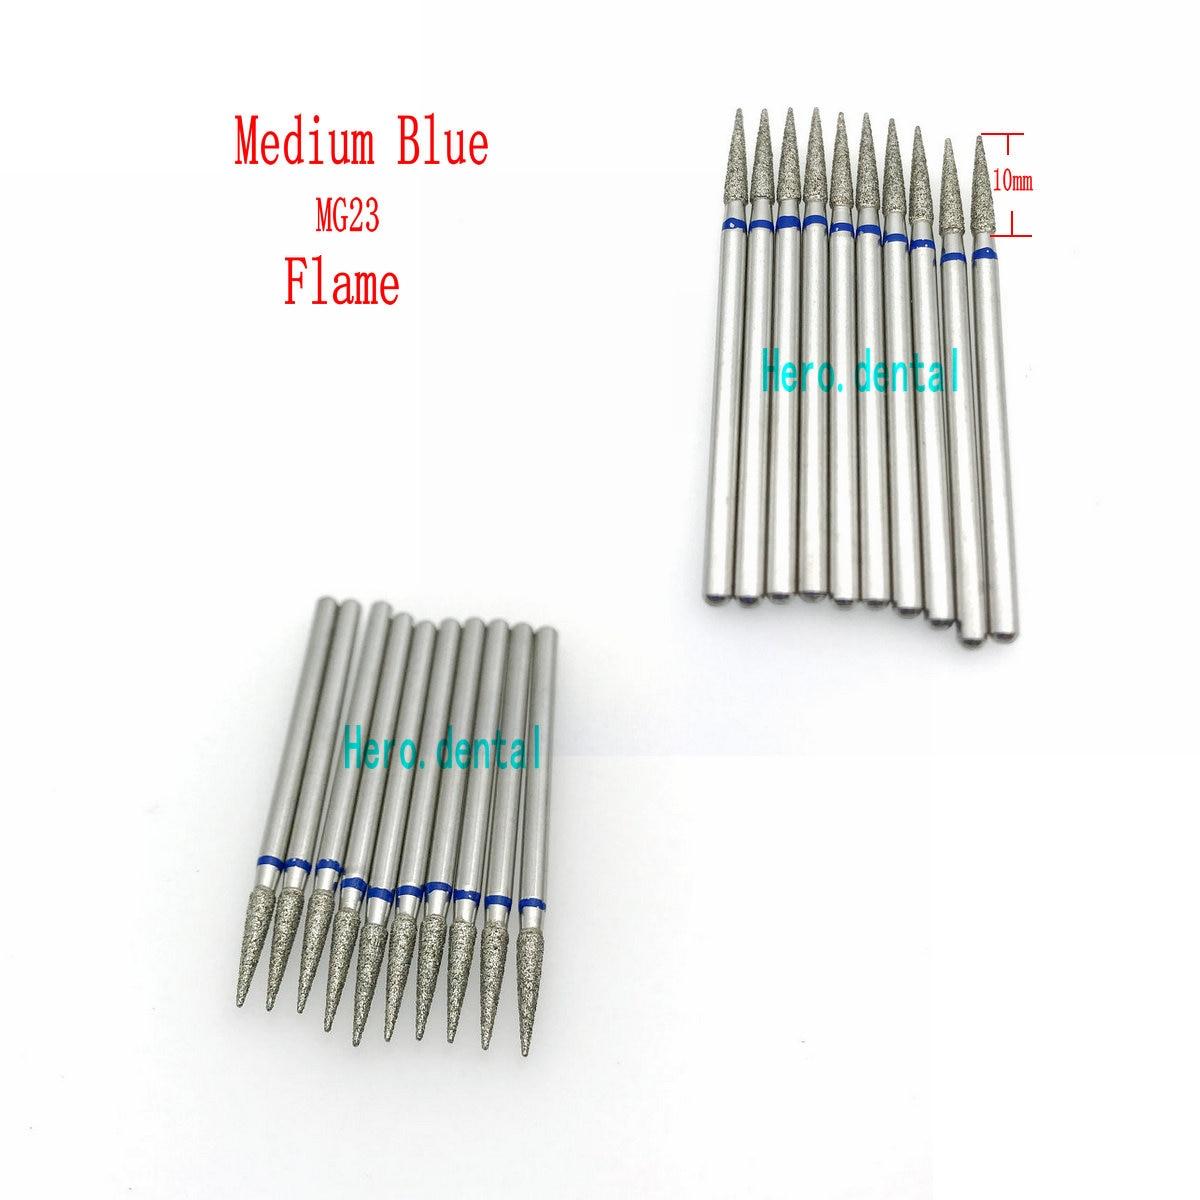 10pcs-235mm-dental-shank-diamond-grinding-bur-drill-bits-for-dental-grinding-flame-taper-pearl-shape-dental-polishing-burs